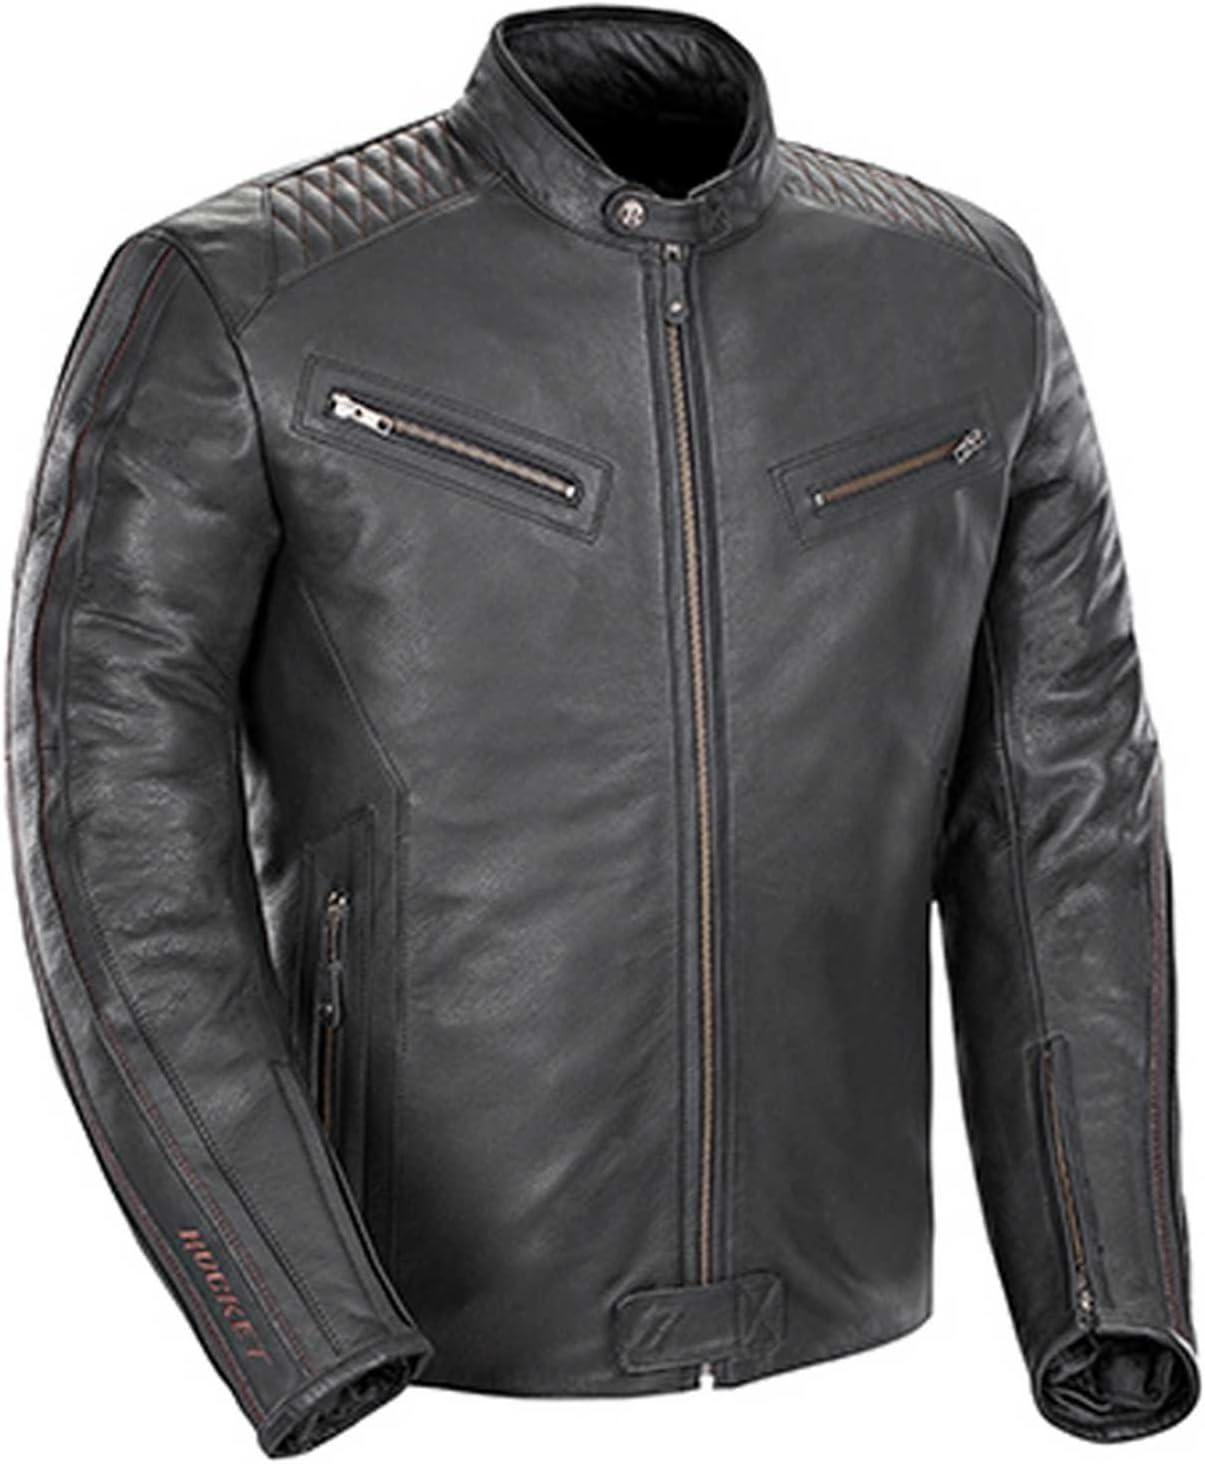 Joe Rocket Vintage Rocket Men's Leather Street Motorcycle Jacket - Black/Black/Medium